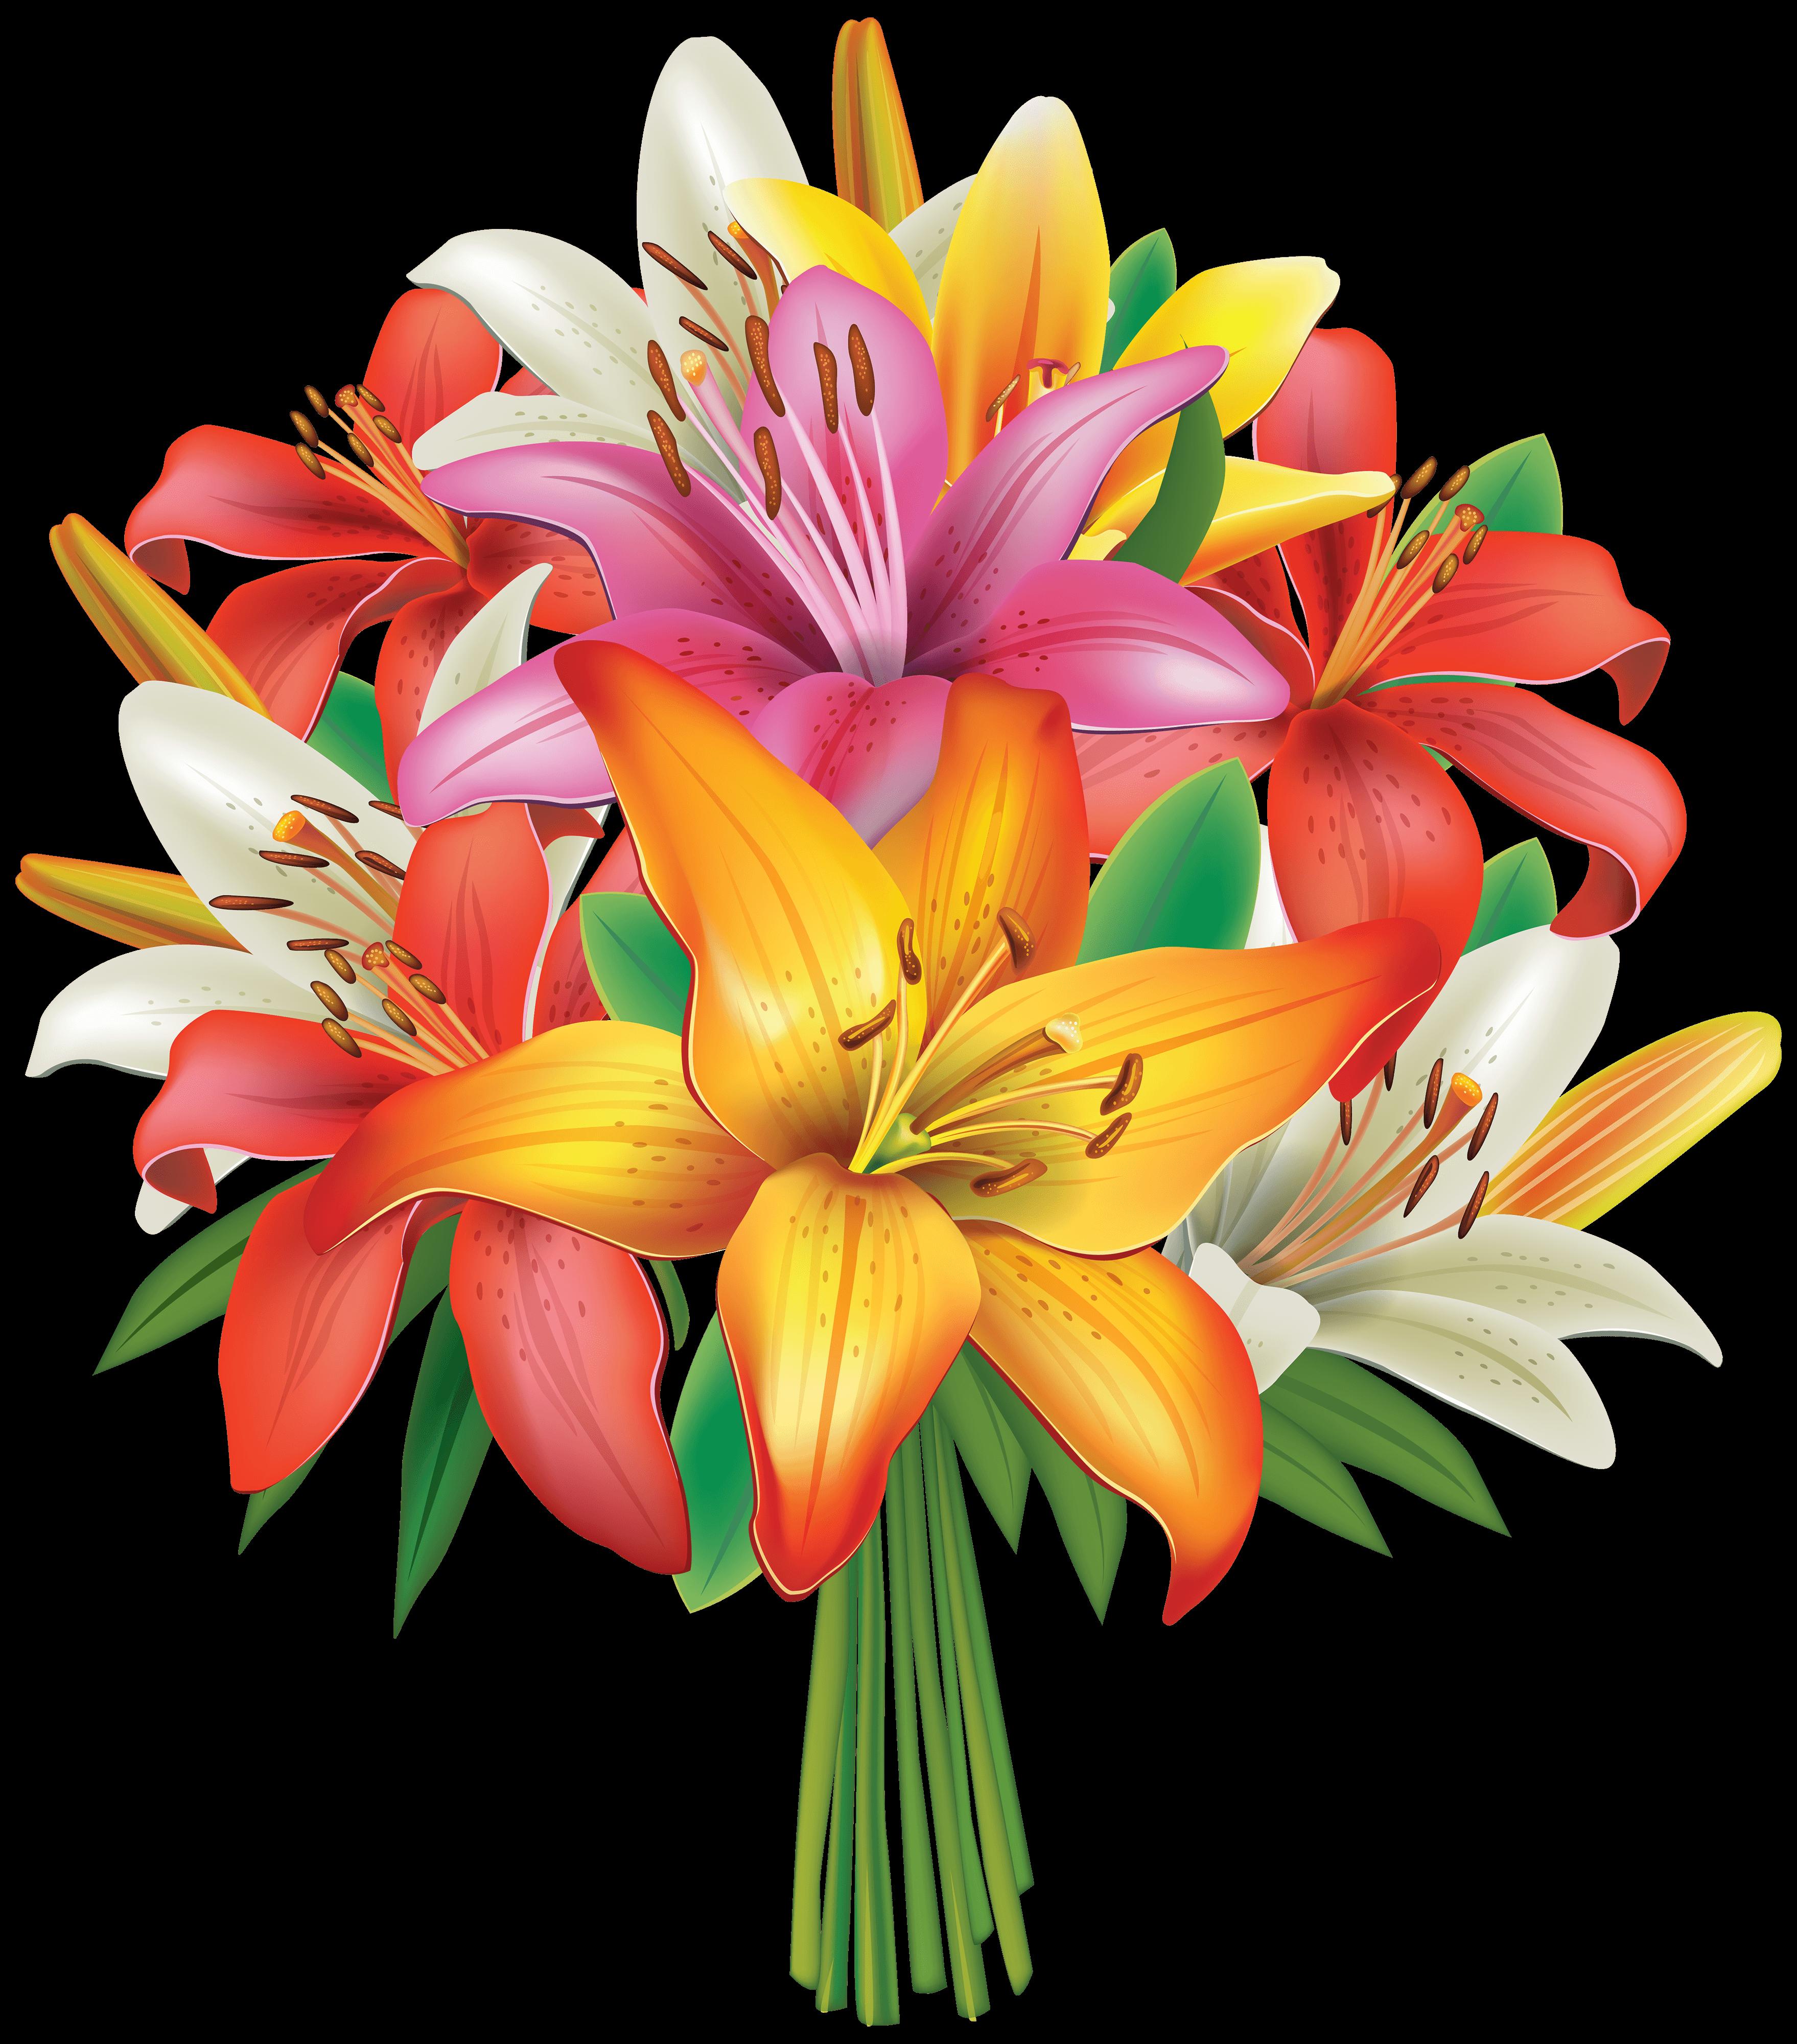 Birthday flowers bouquet clipart vector transparent Flower Bouquet Cliparts - Cliparts Zone vector transparent